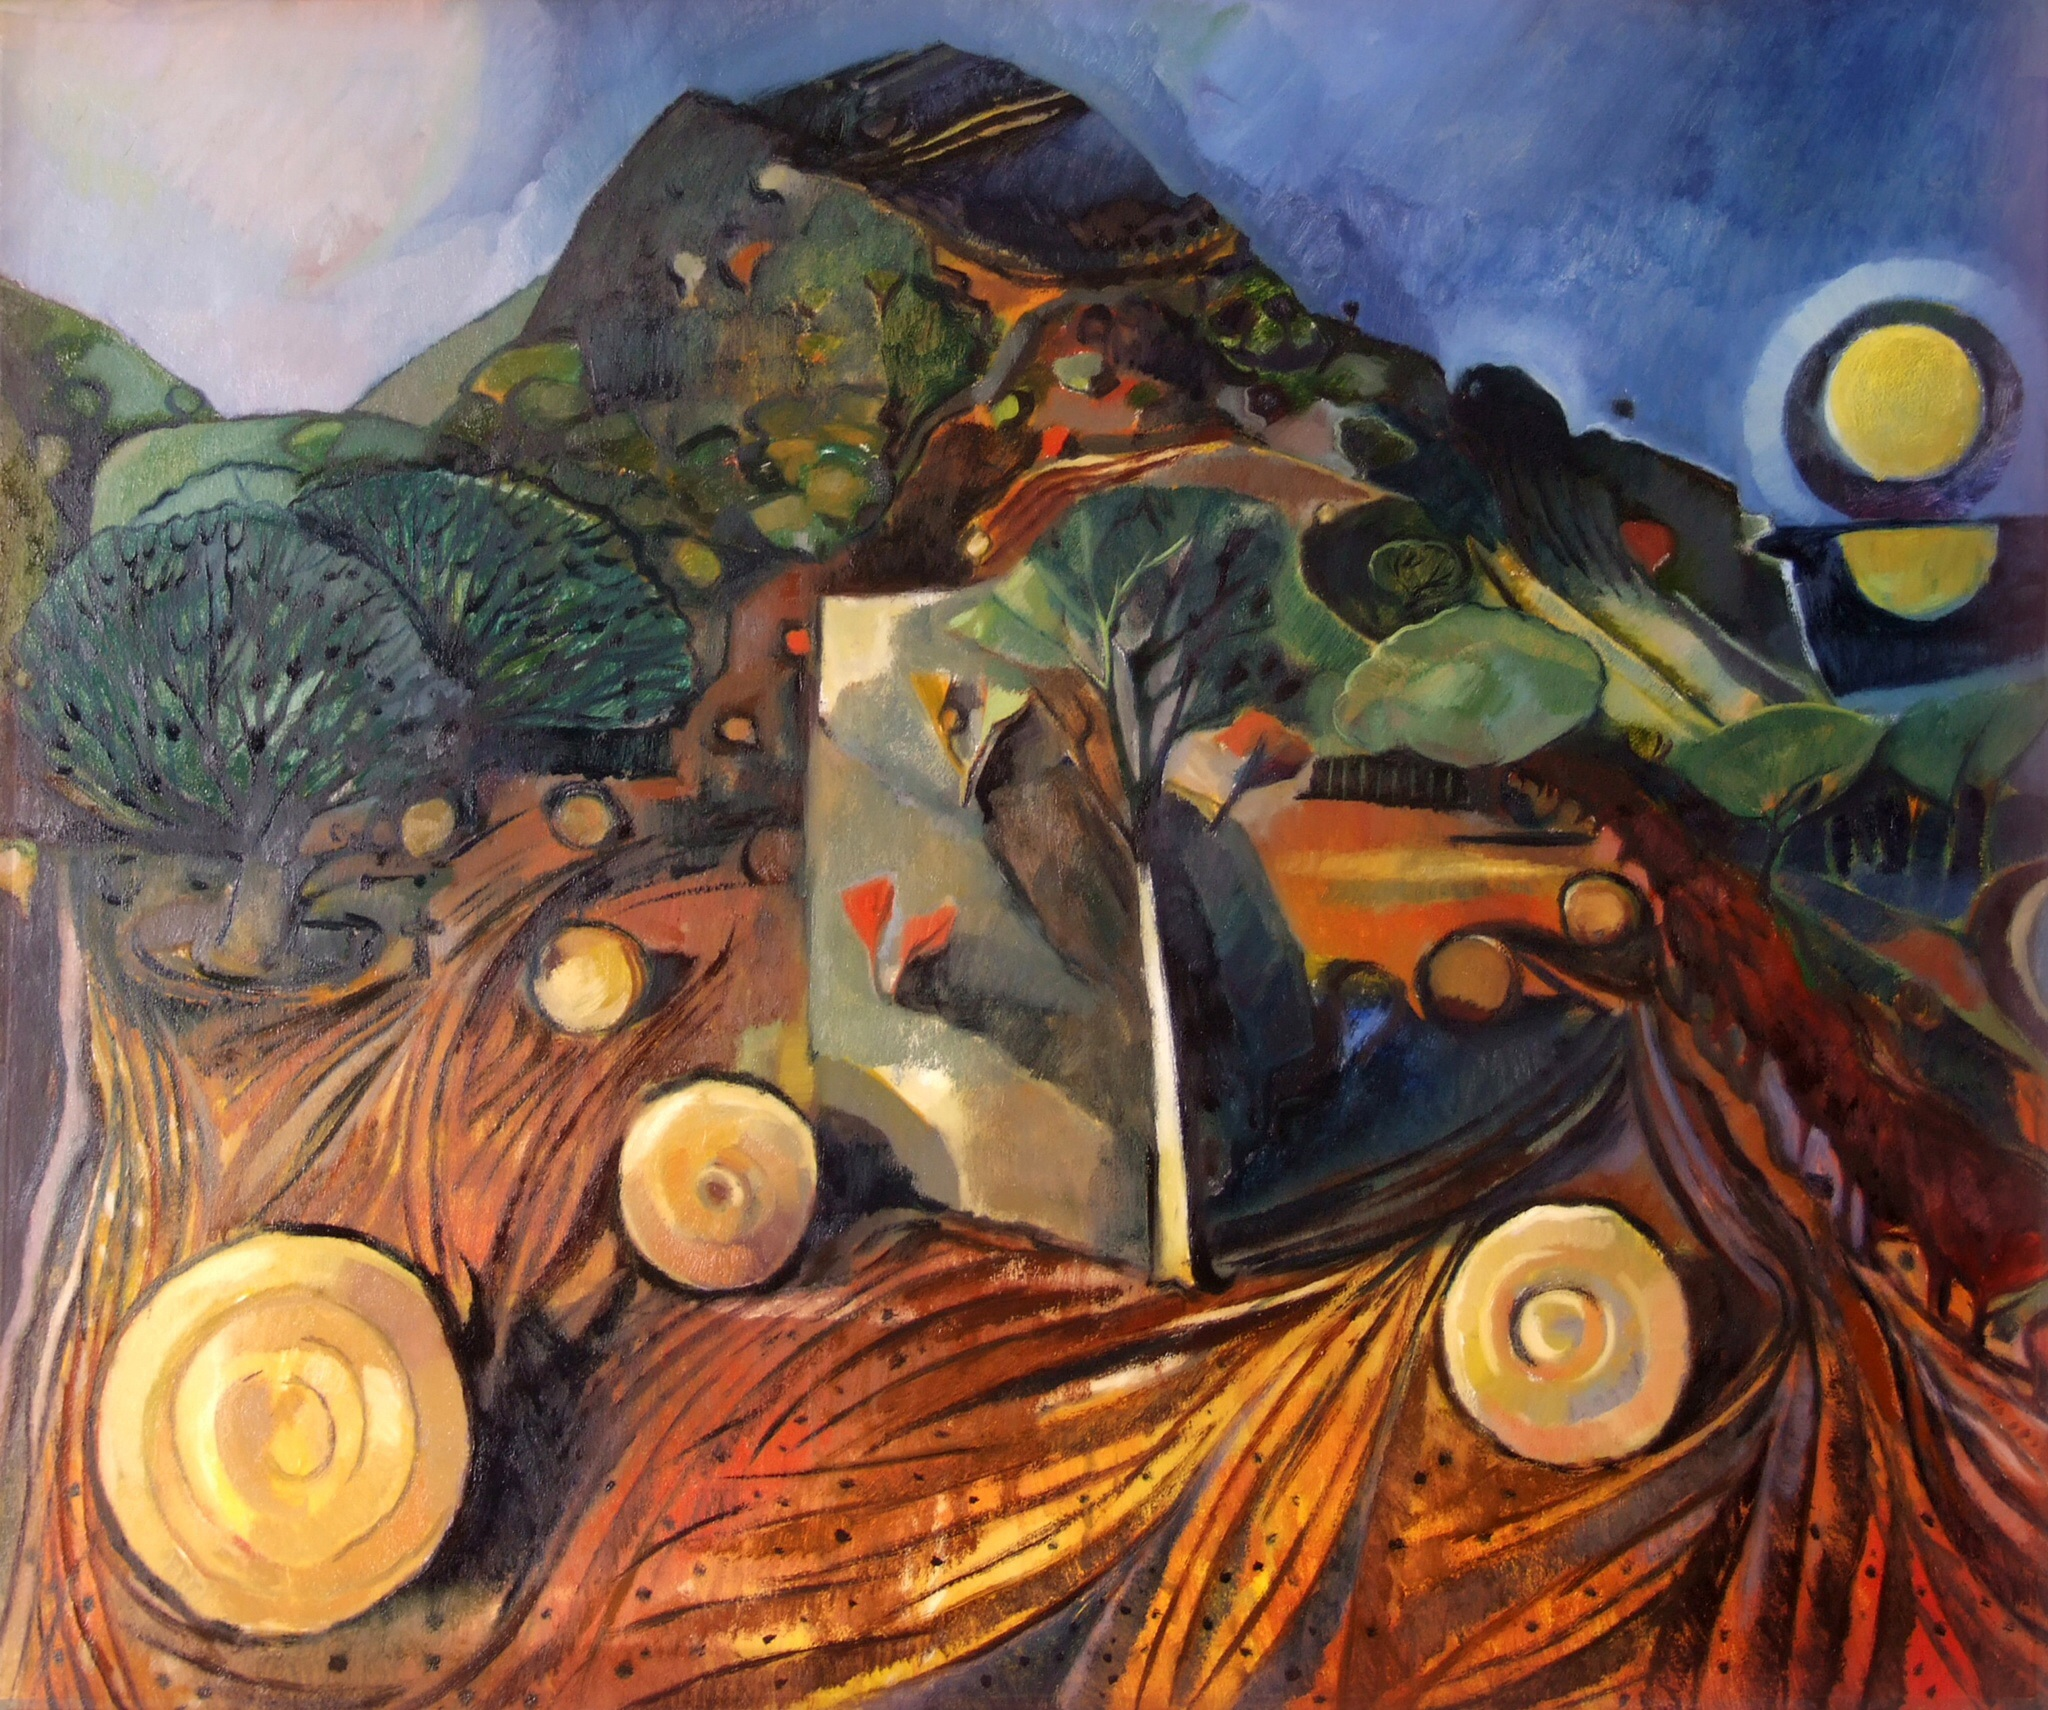 Steve Des Landes - Monolith 2